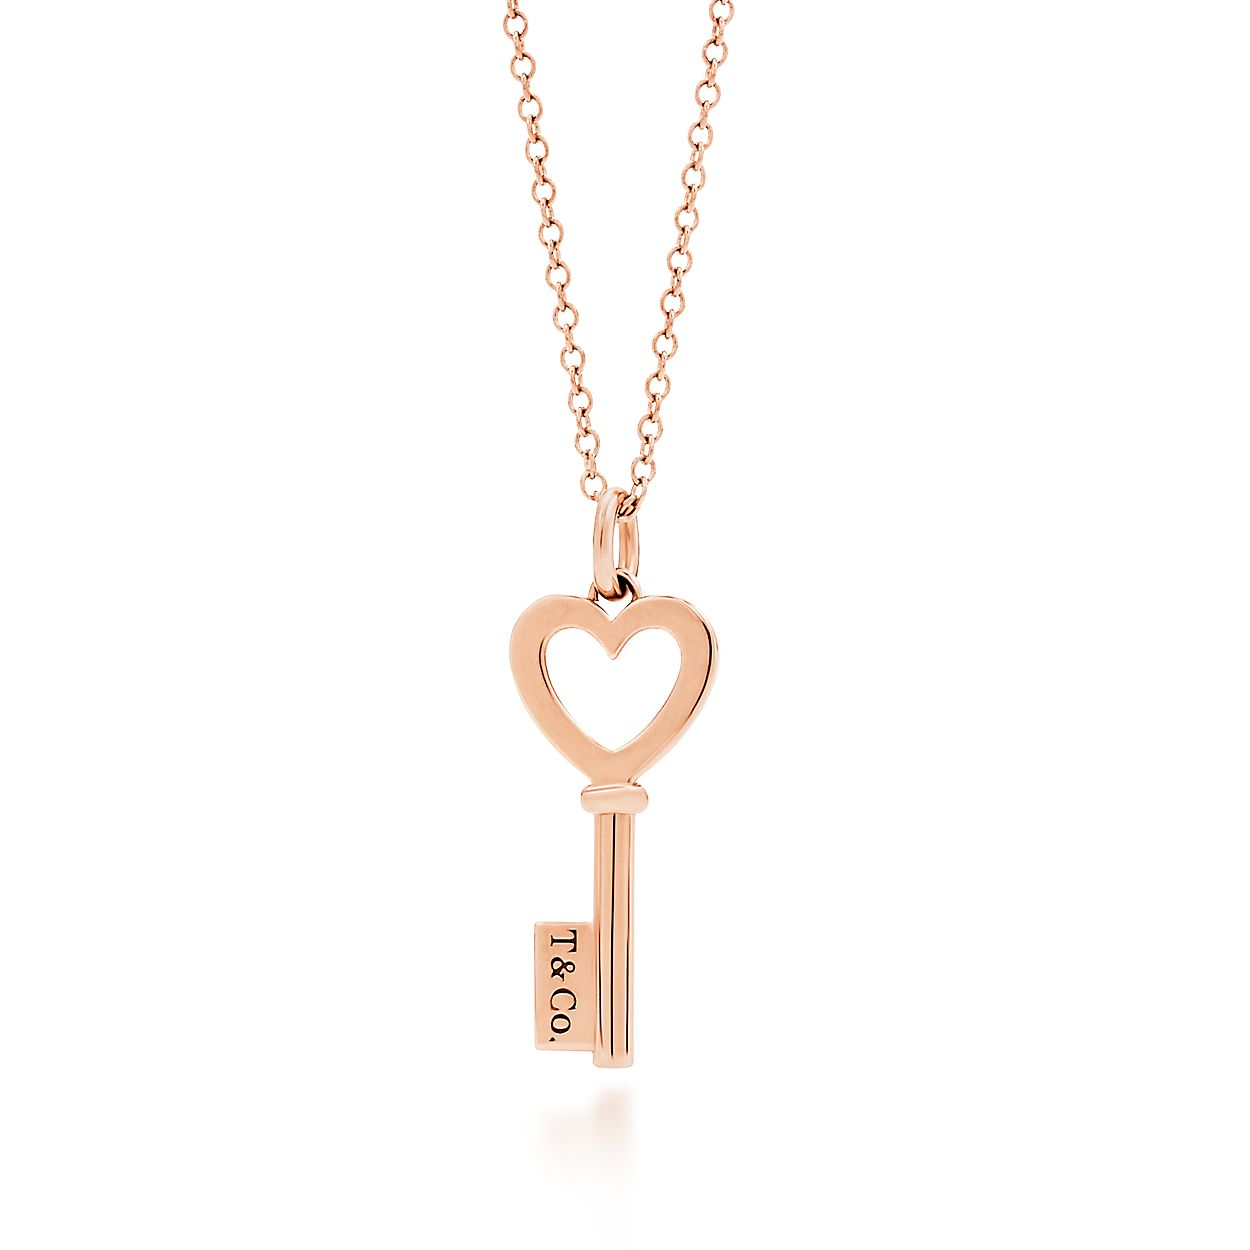 Tiffany Keys heart key pendant in 18k rose gold, mini. | Tiffany & Co.